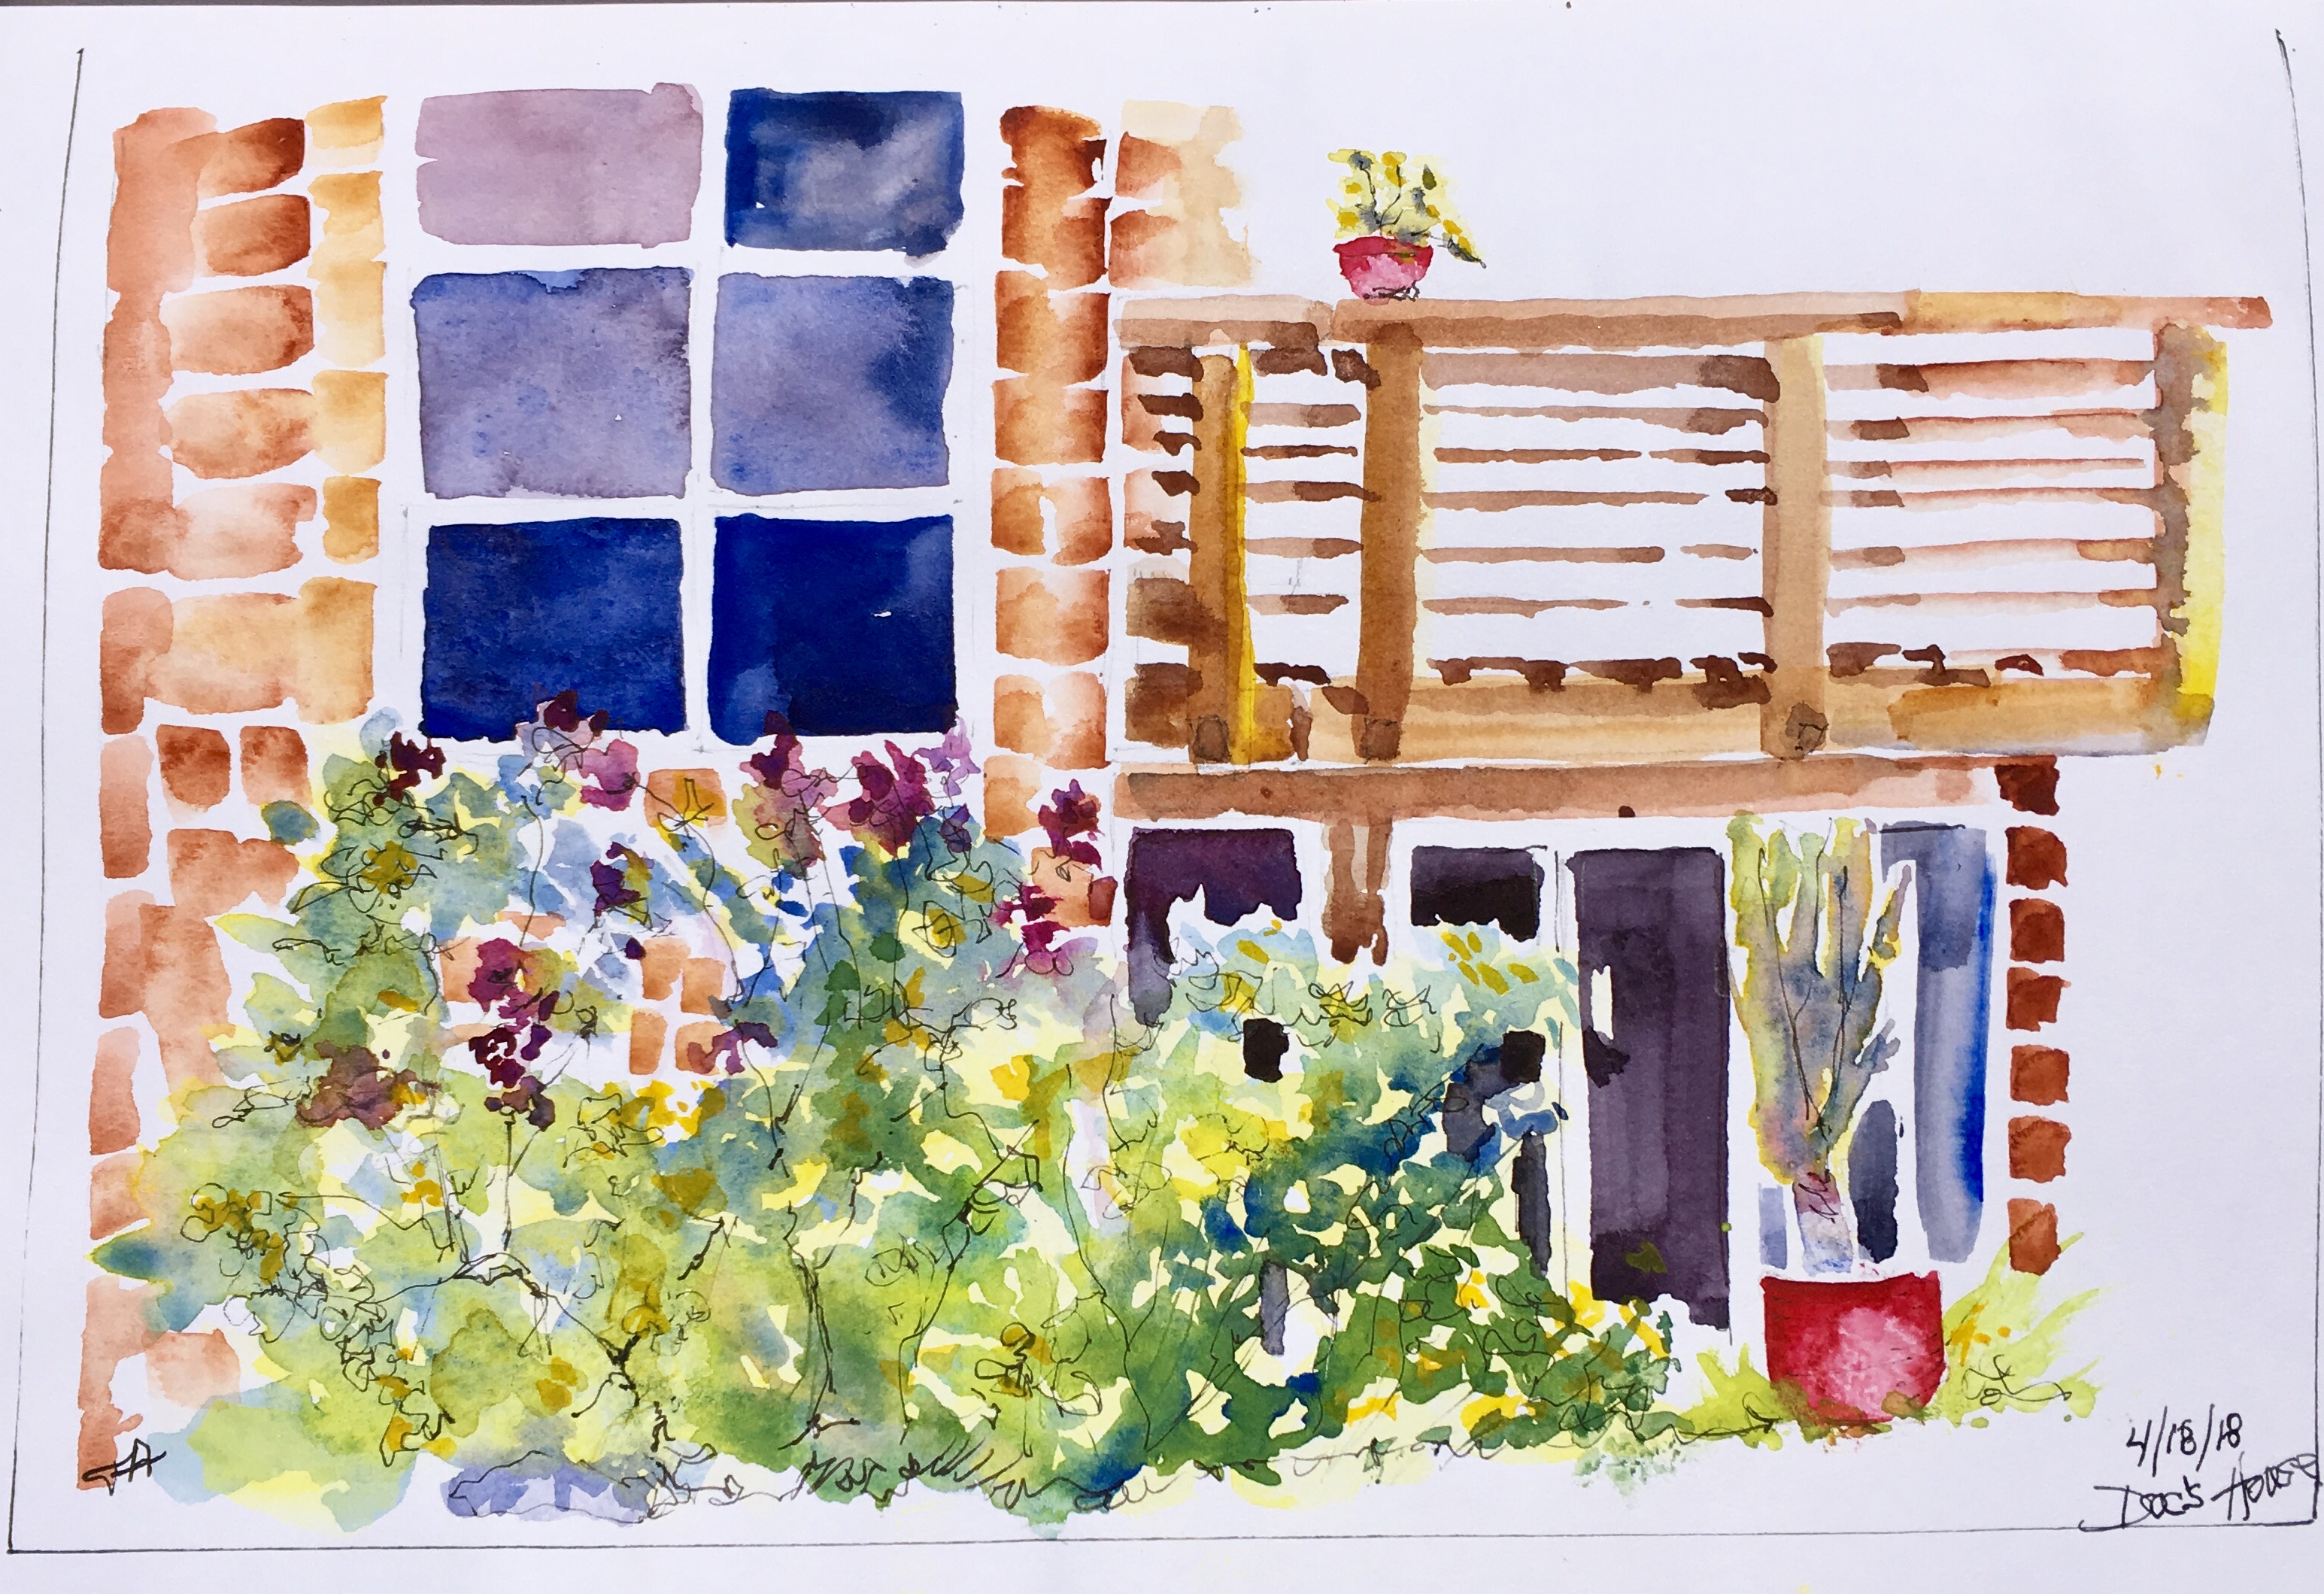 Arne's Deck #2